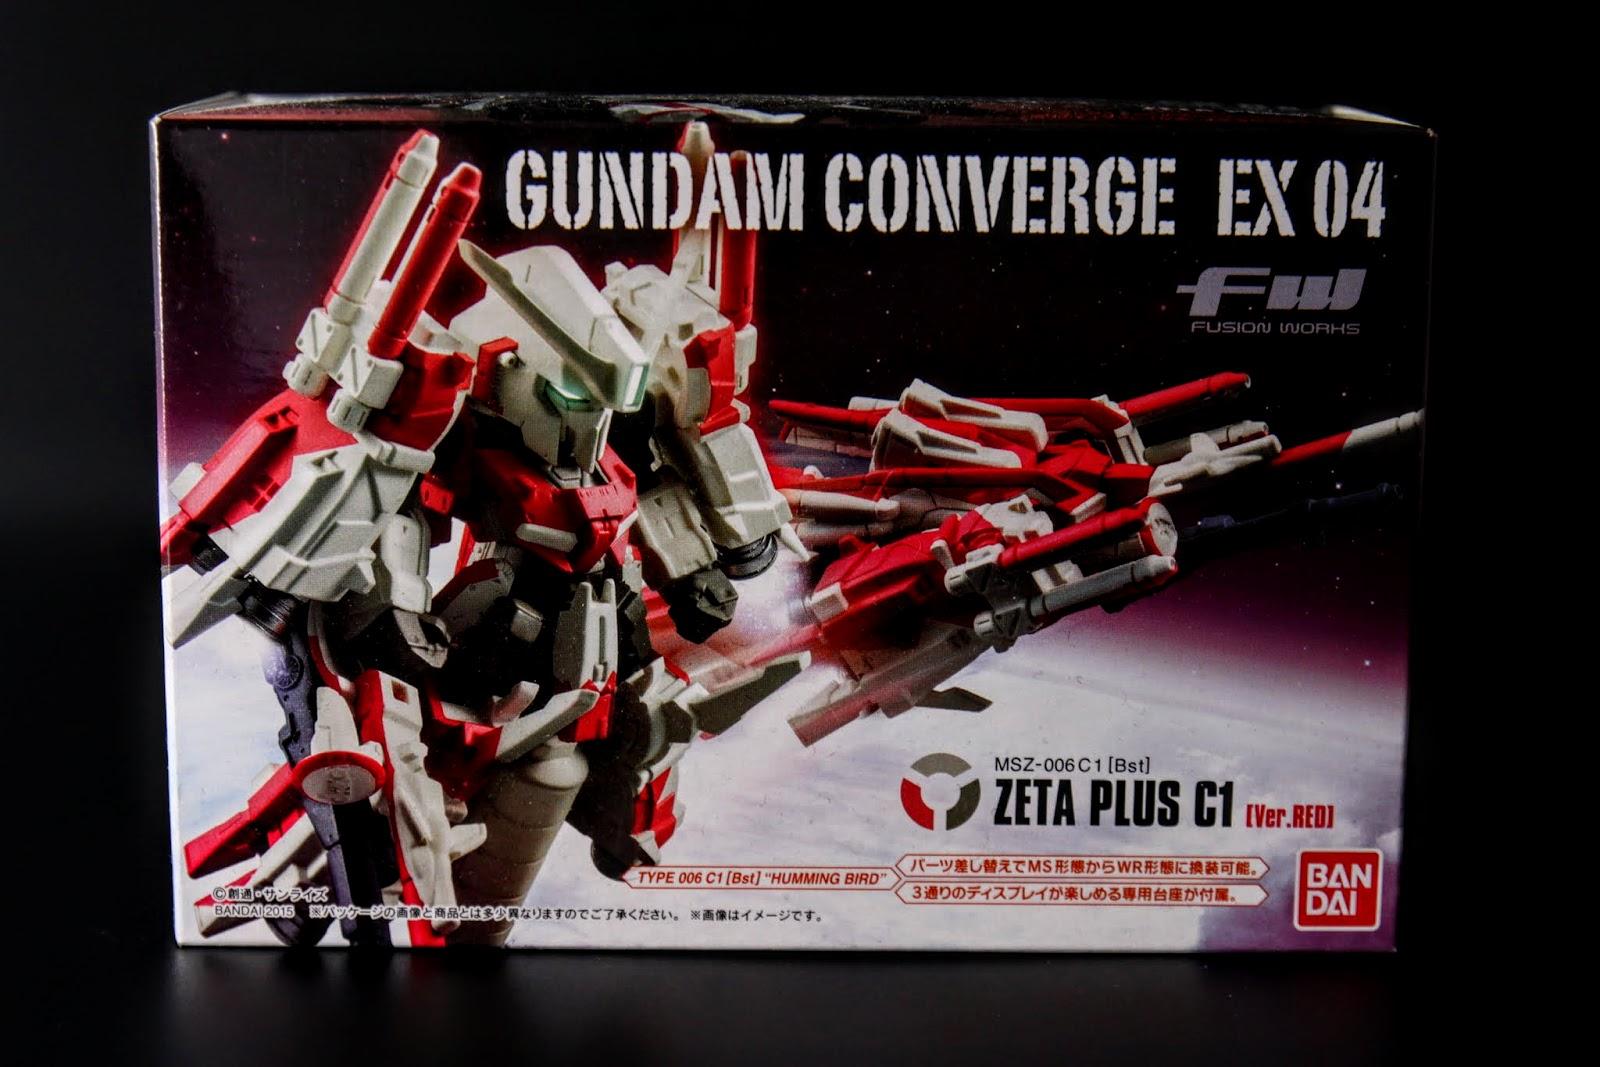 ZETA PLUS C1 [Bst], ZETA+運用類似S Gundam的Boost型態技術, 加強單機一擊脫離的狀態 此型態俗稱:蜂鳥